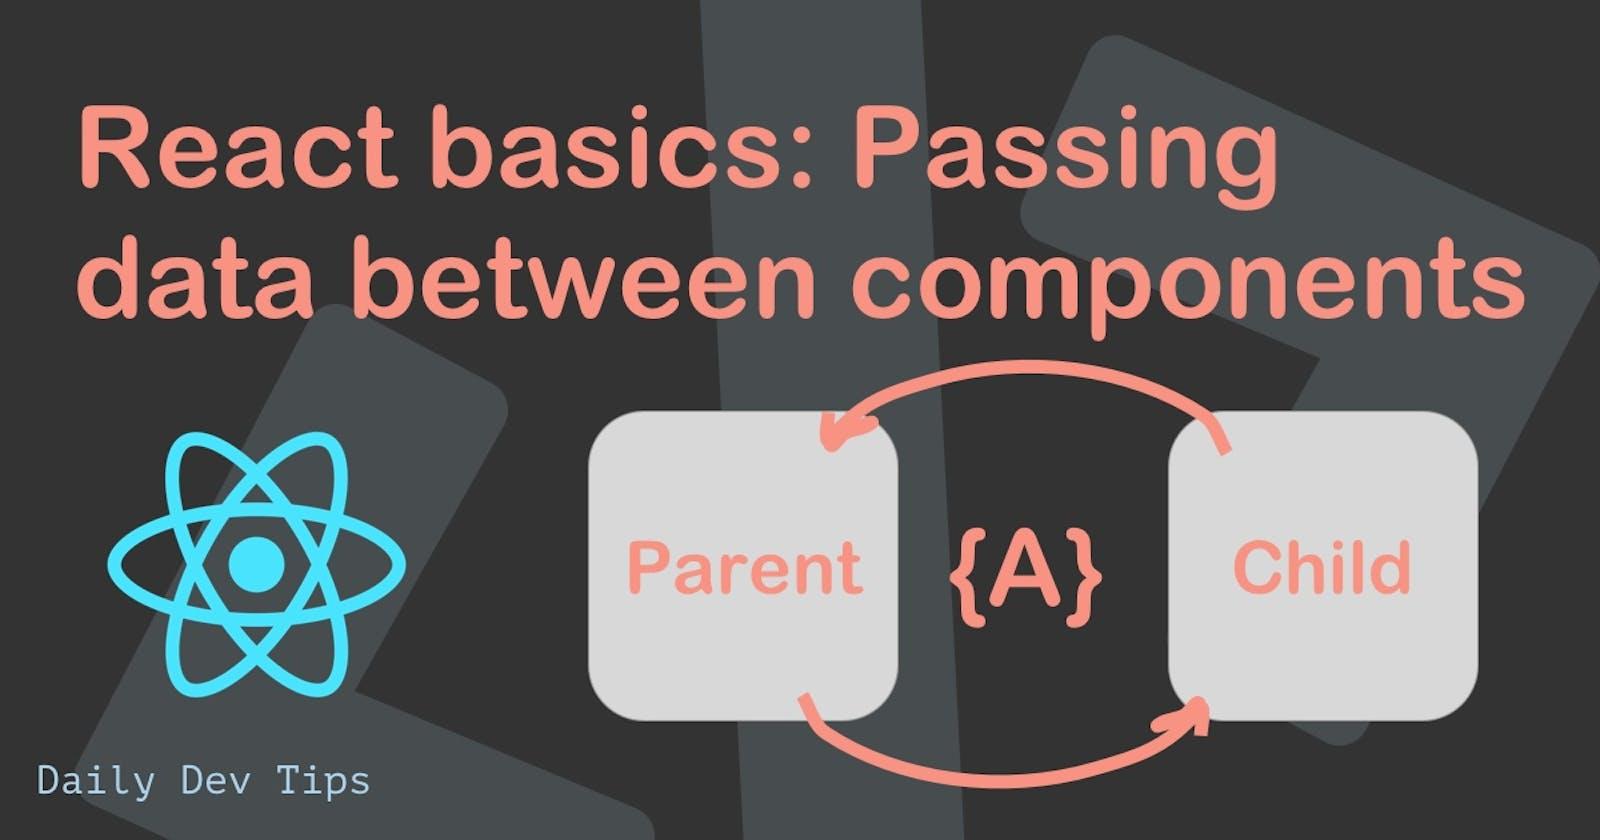 React basics: Passing data between components